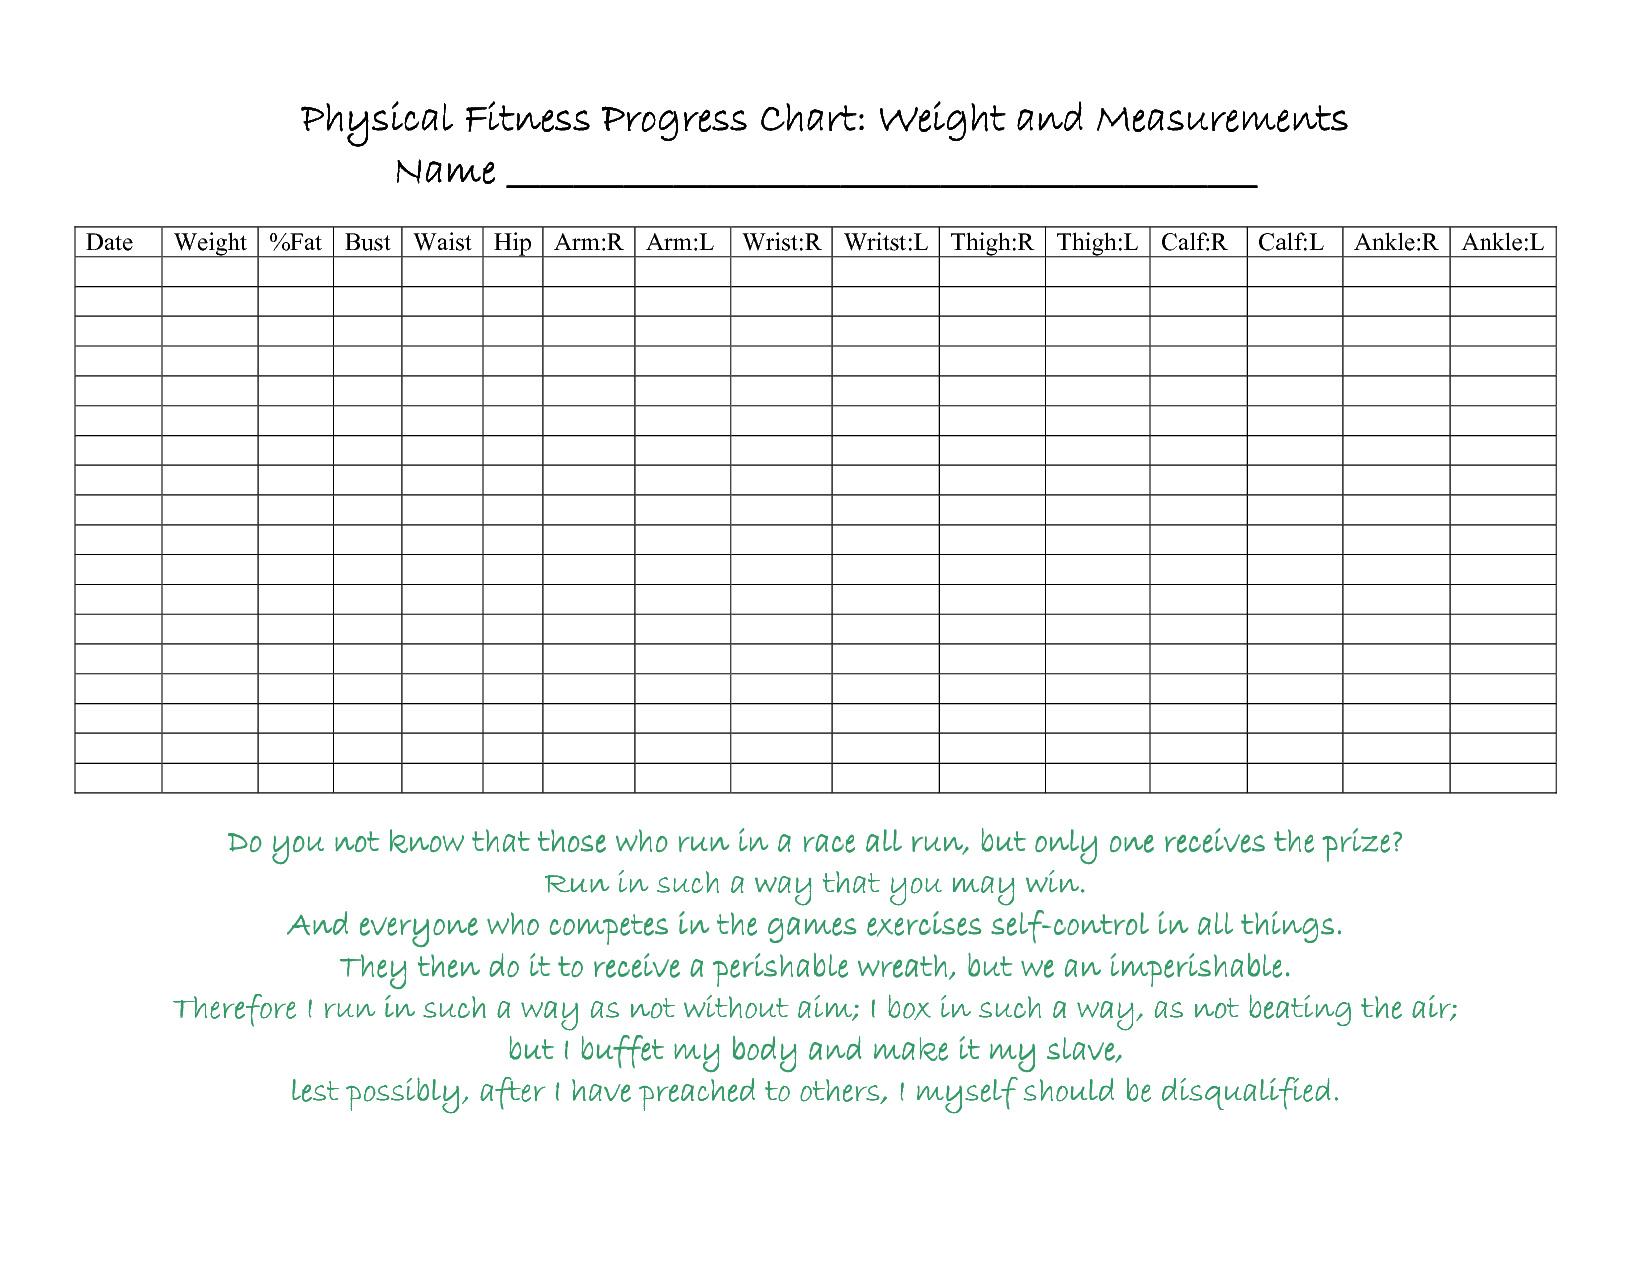 Personal Management Merit Badge Excel Spreadsheet Pertaining To Personal Management Merit Badge Excel Spreadsheet  The Spreadsheet